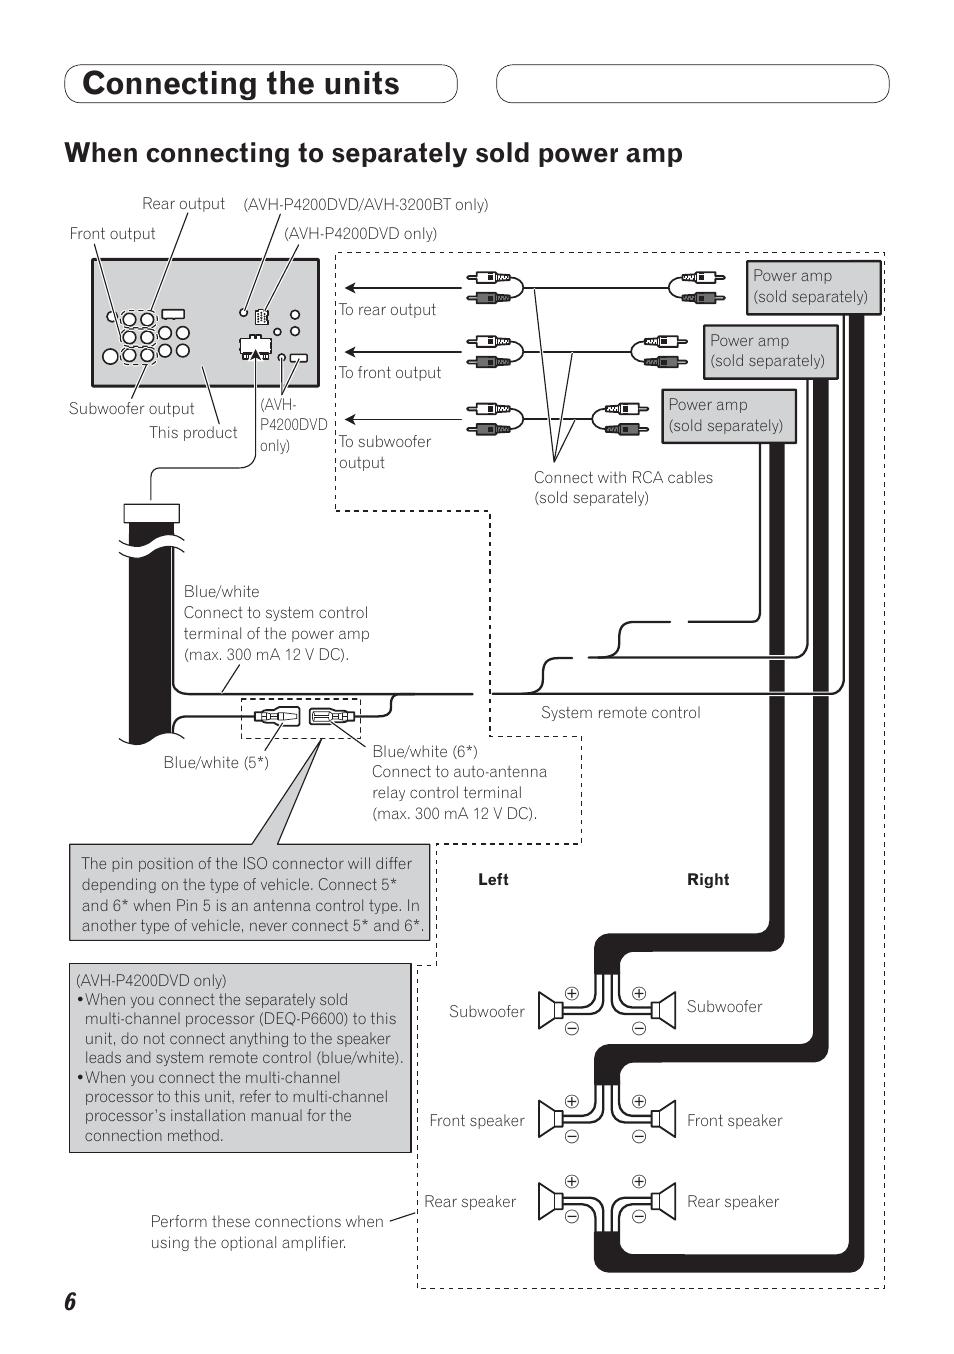 medium resolution of wiring diagram for pioneer avh p4200dvd wiring diagram pioneer avh p3100dvd wiring harness pioneer avh p4000dvd